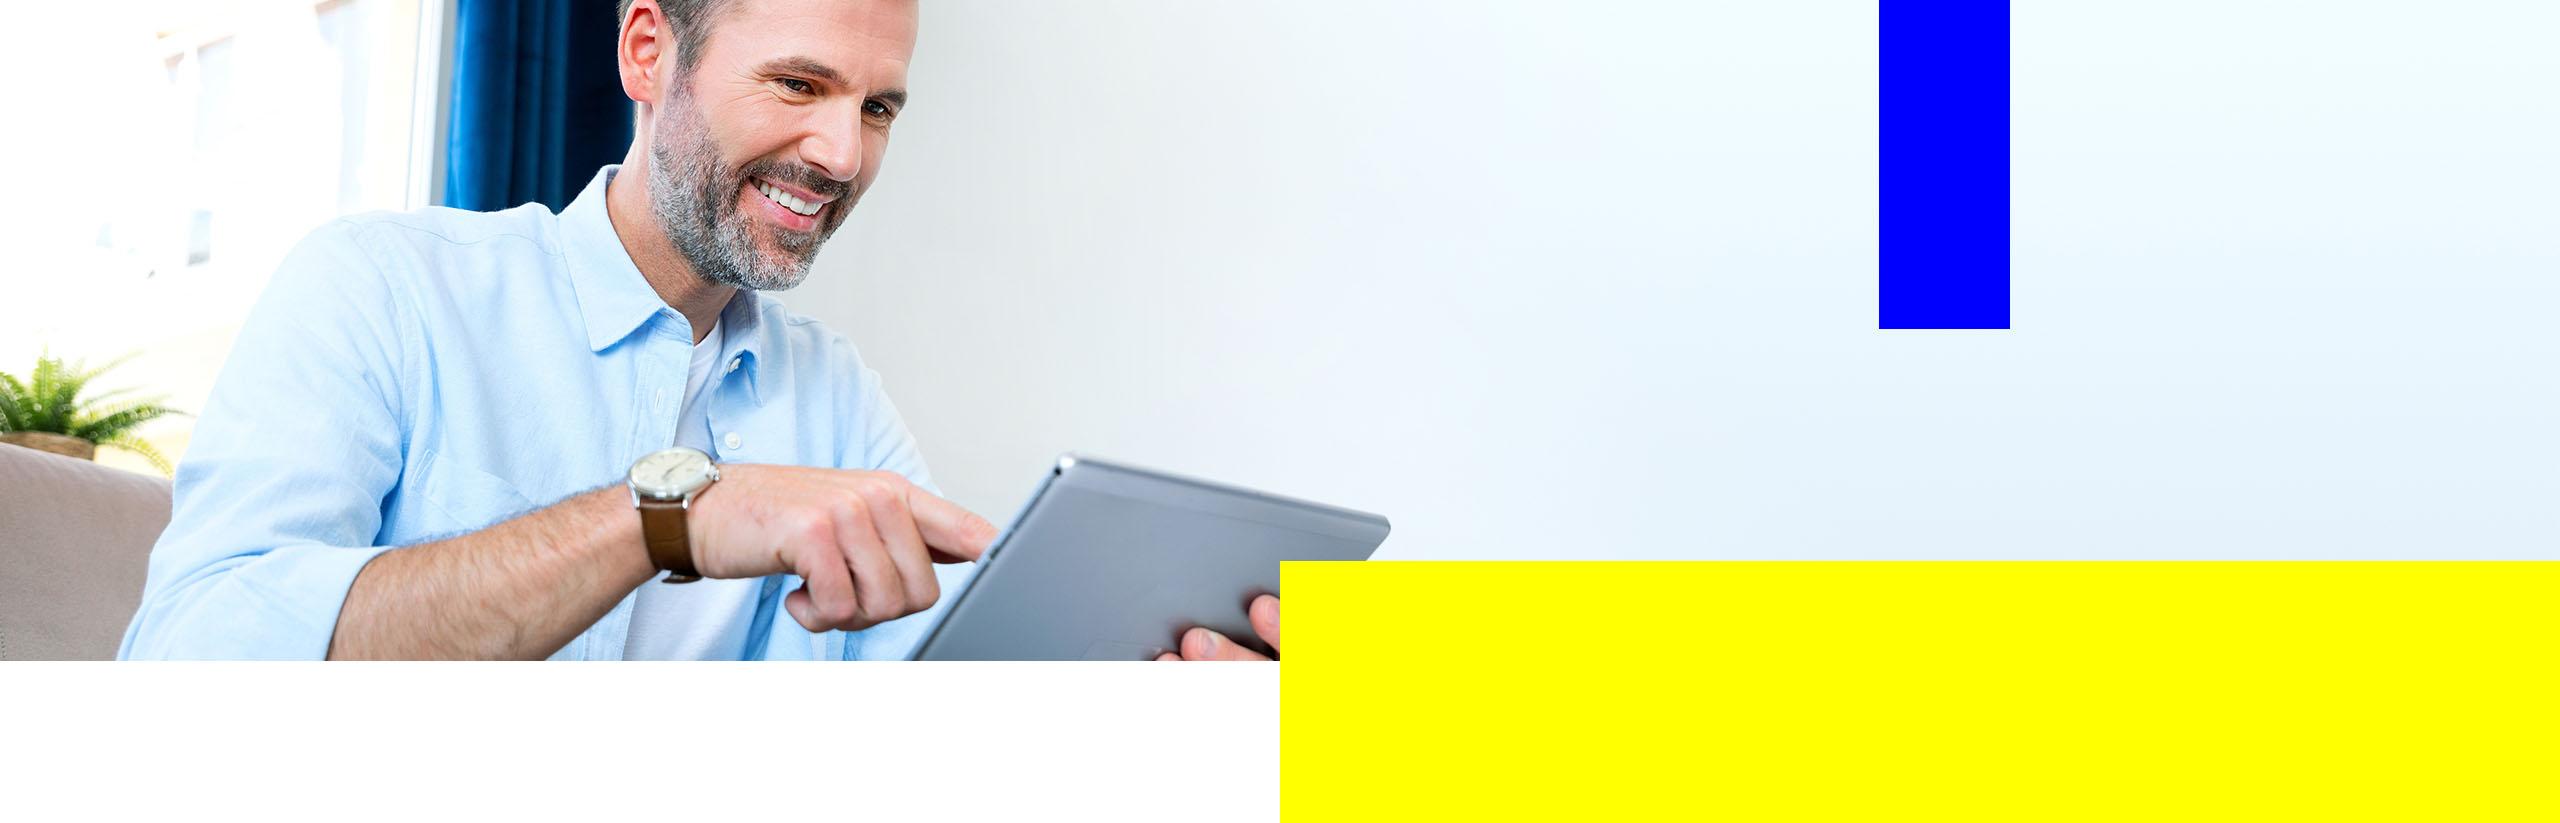 header-bild-interaktive-digitale-beratung-kundeninteraktion-mit-bridge-online-beratung-software-neu